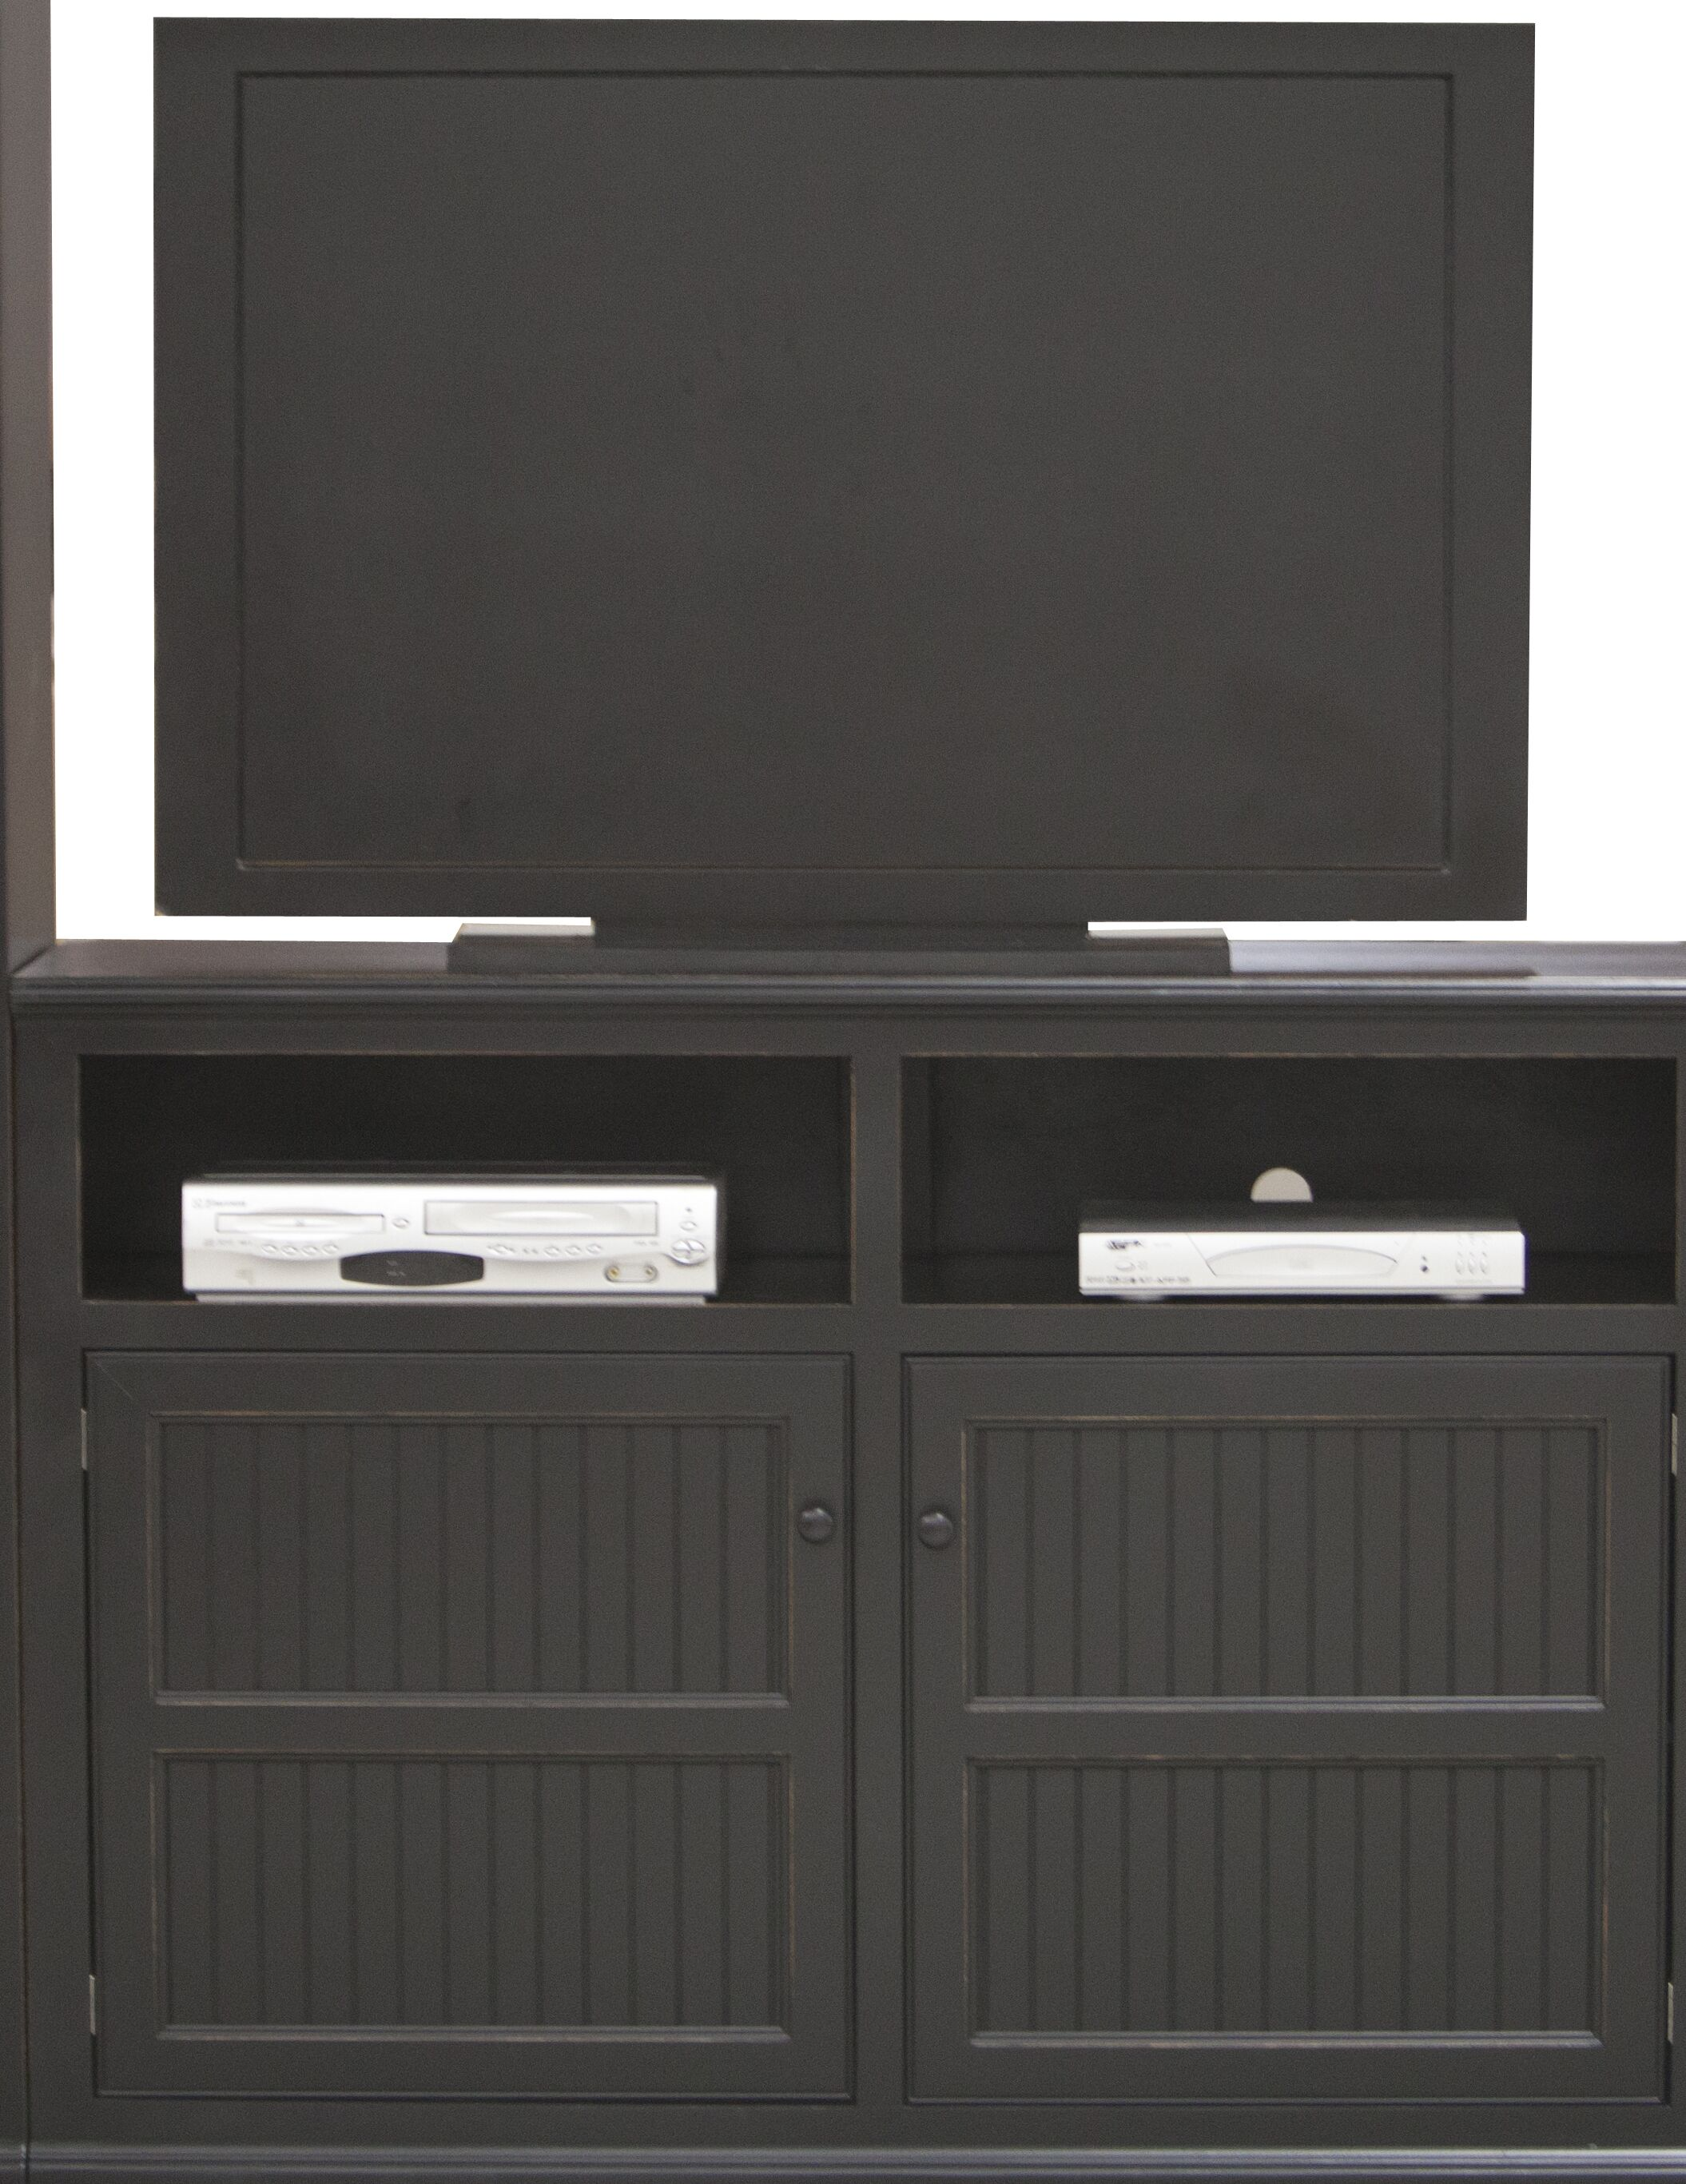 Didier Country Birchwood TV Stand Door Type: Wood, Color: Hazy Sunrise